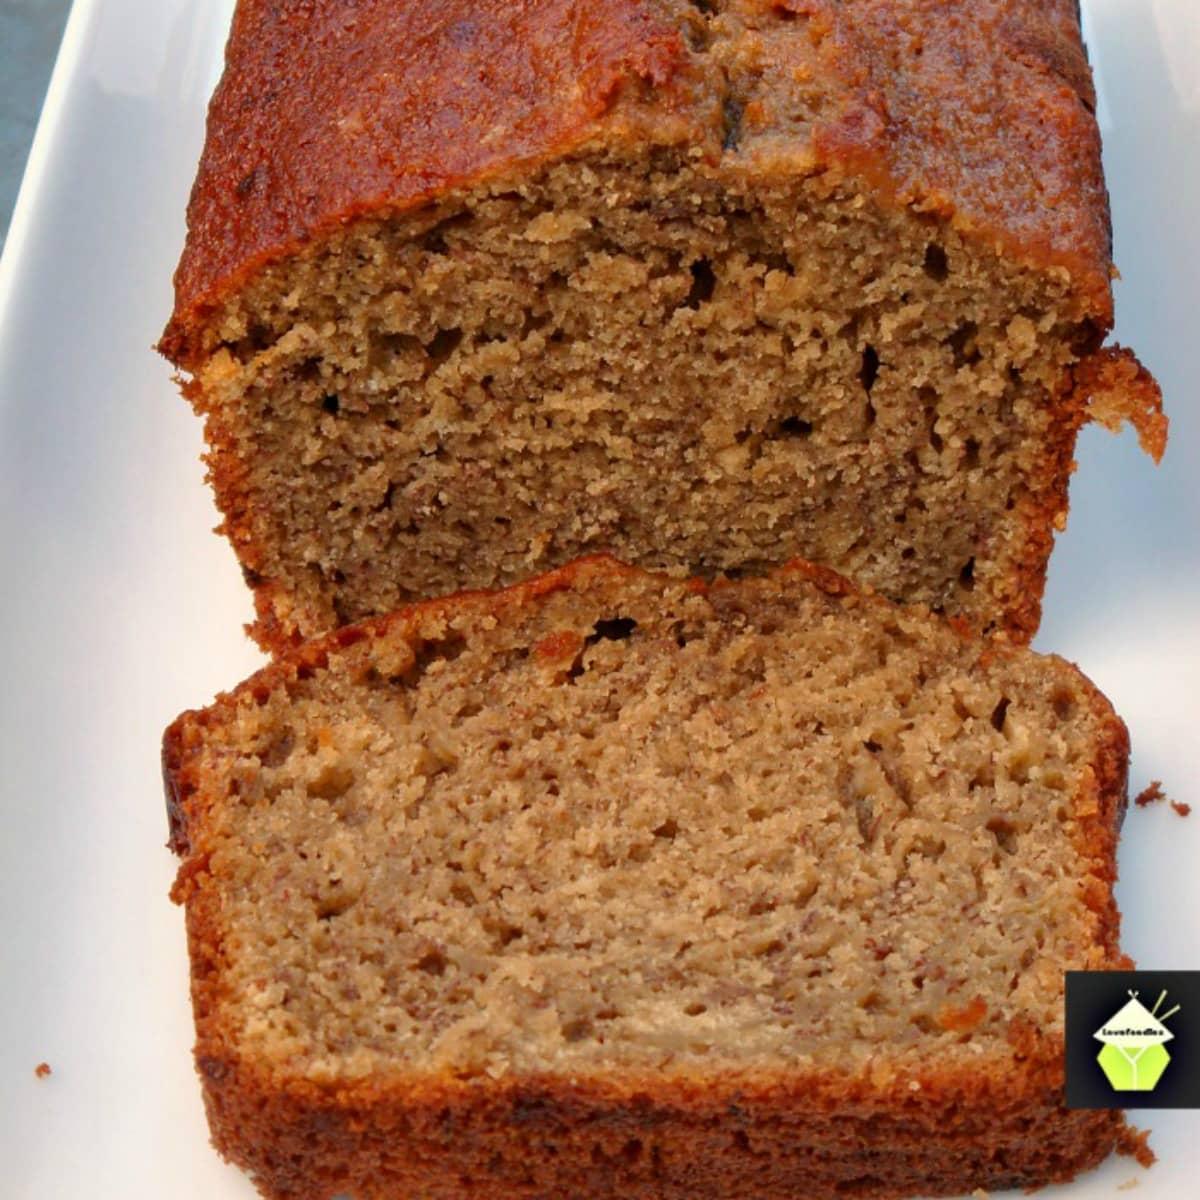 Coffee Loaf CakeF